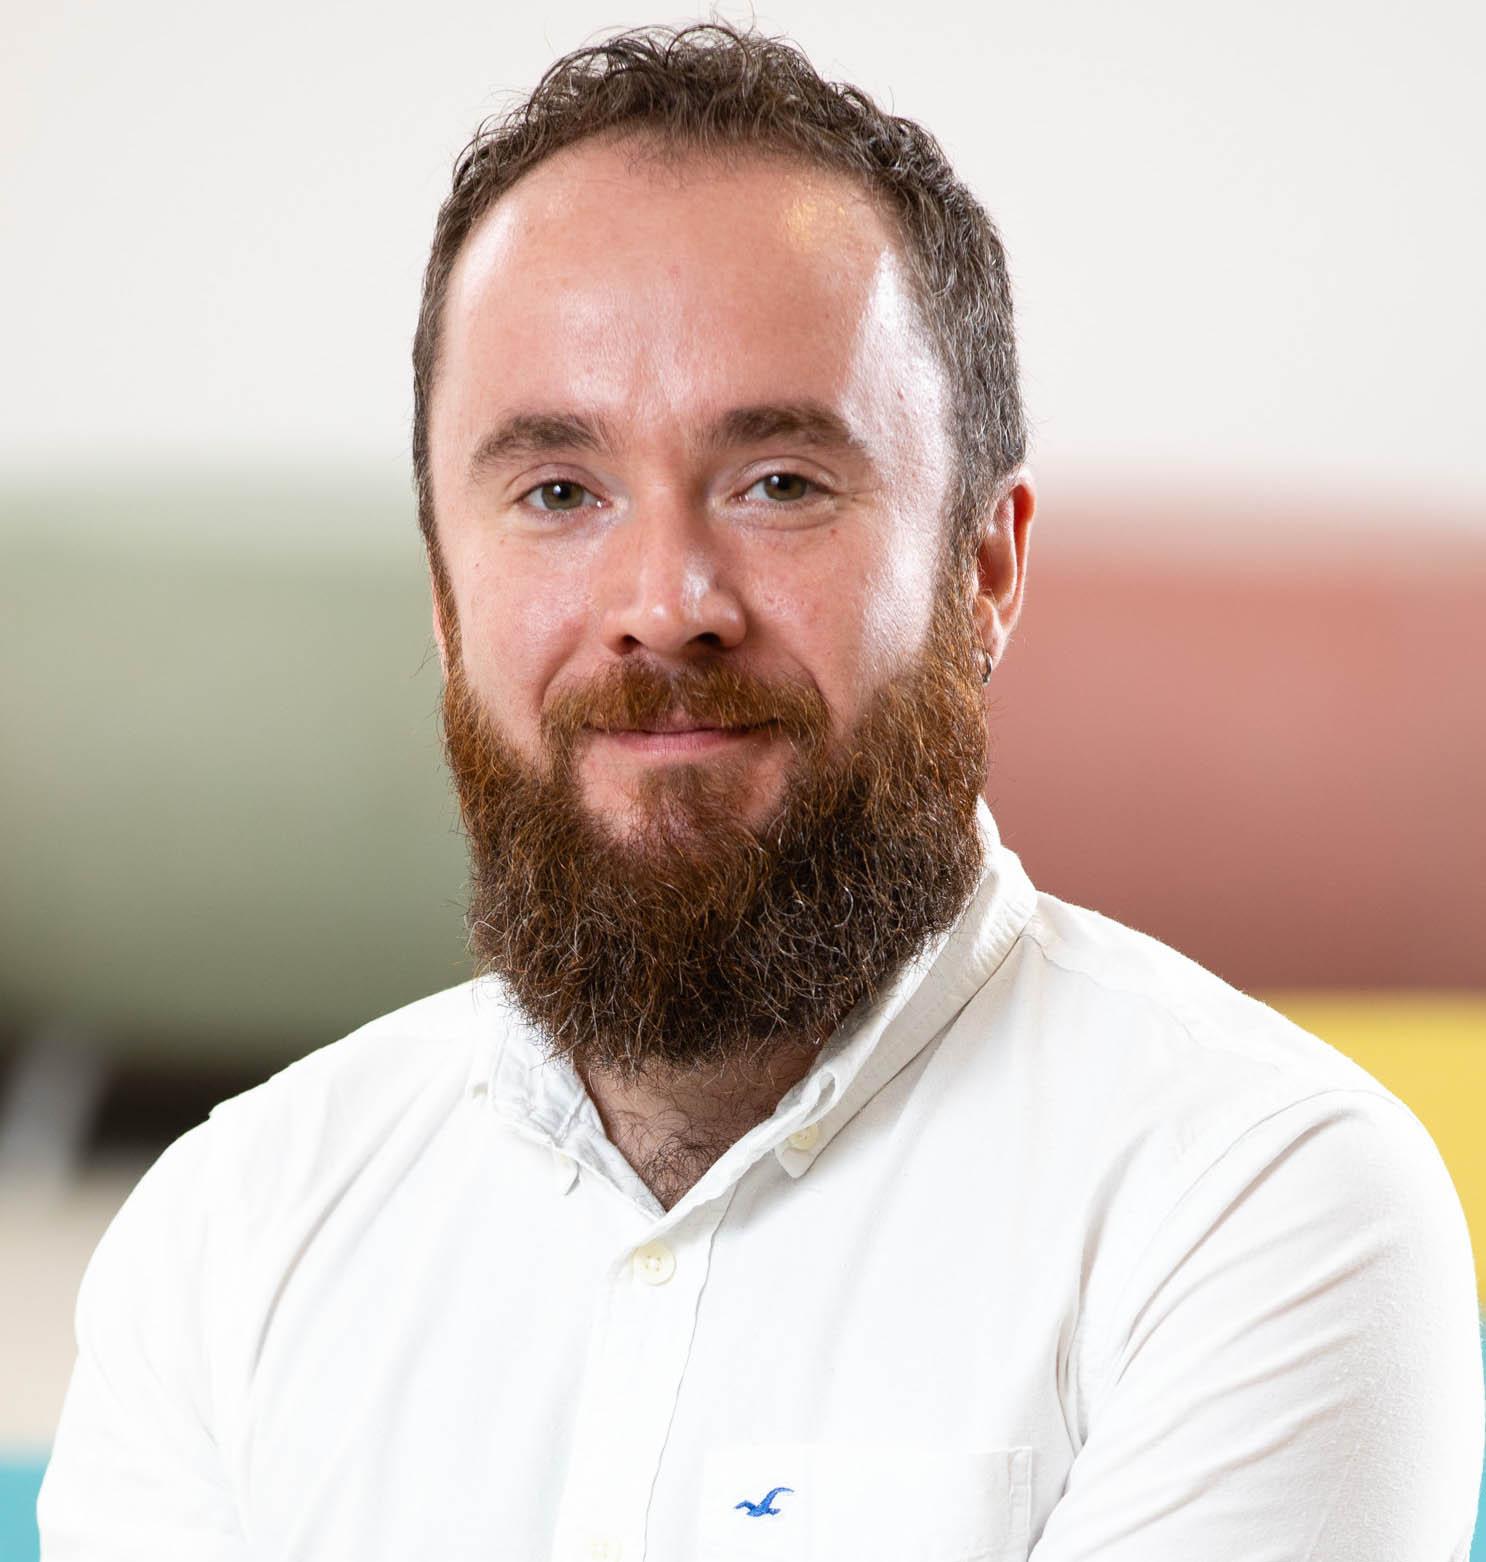 Fraser Gilmore Care Opinion Scotland